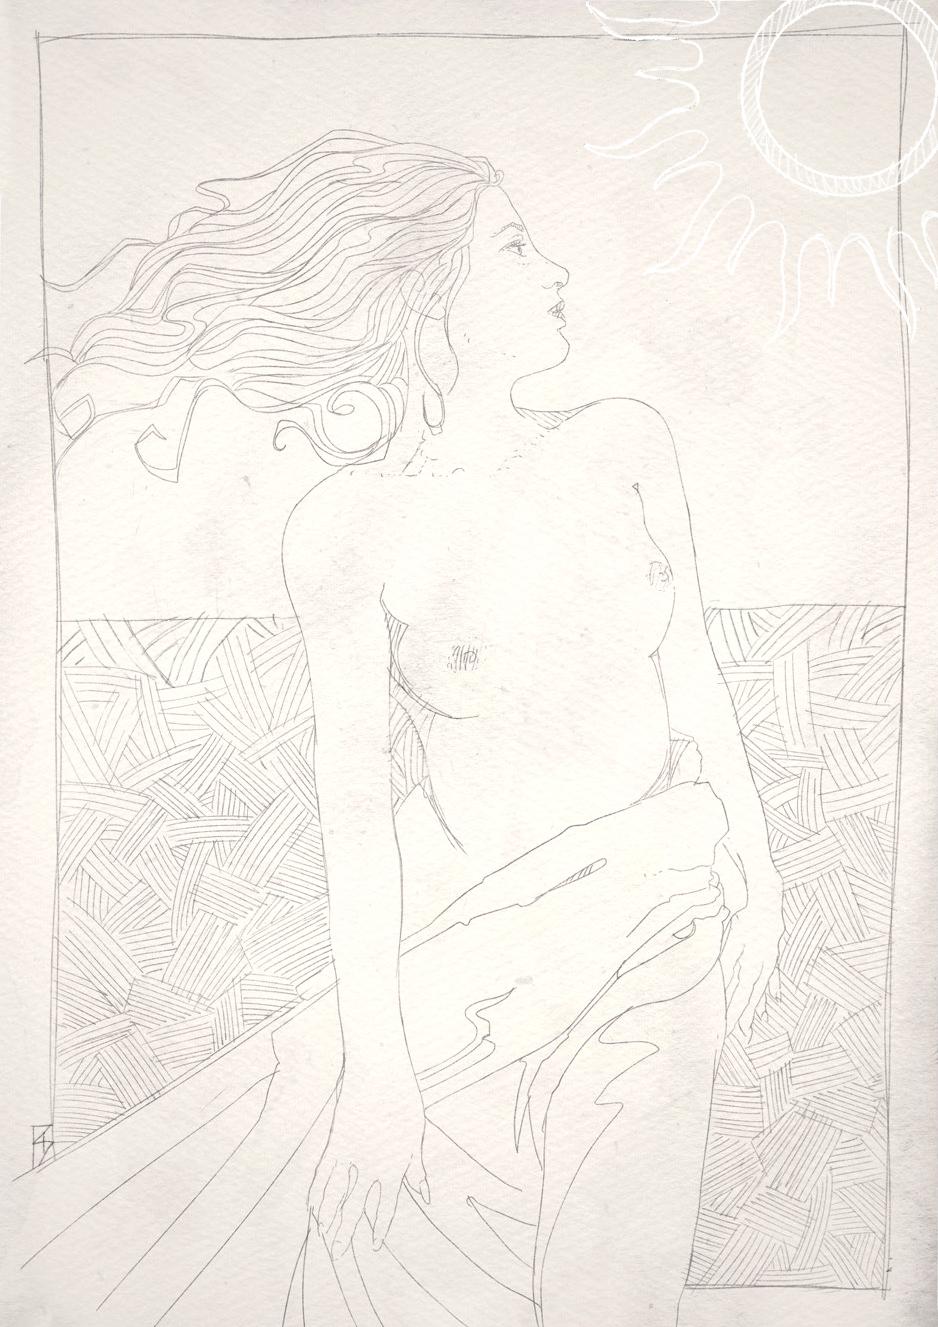 pencil-sketch-6th-april.jpg